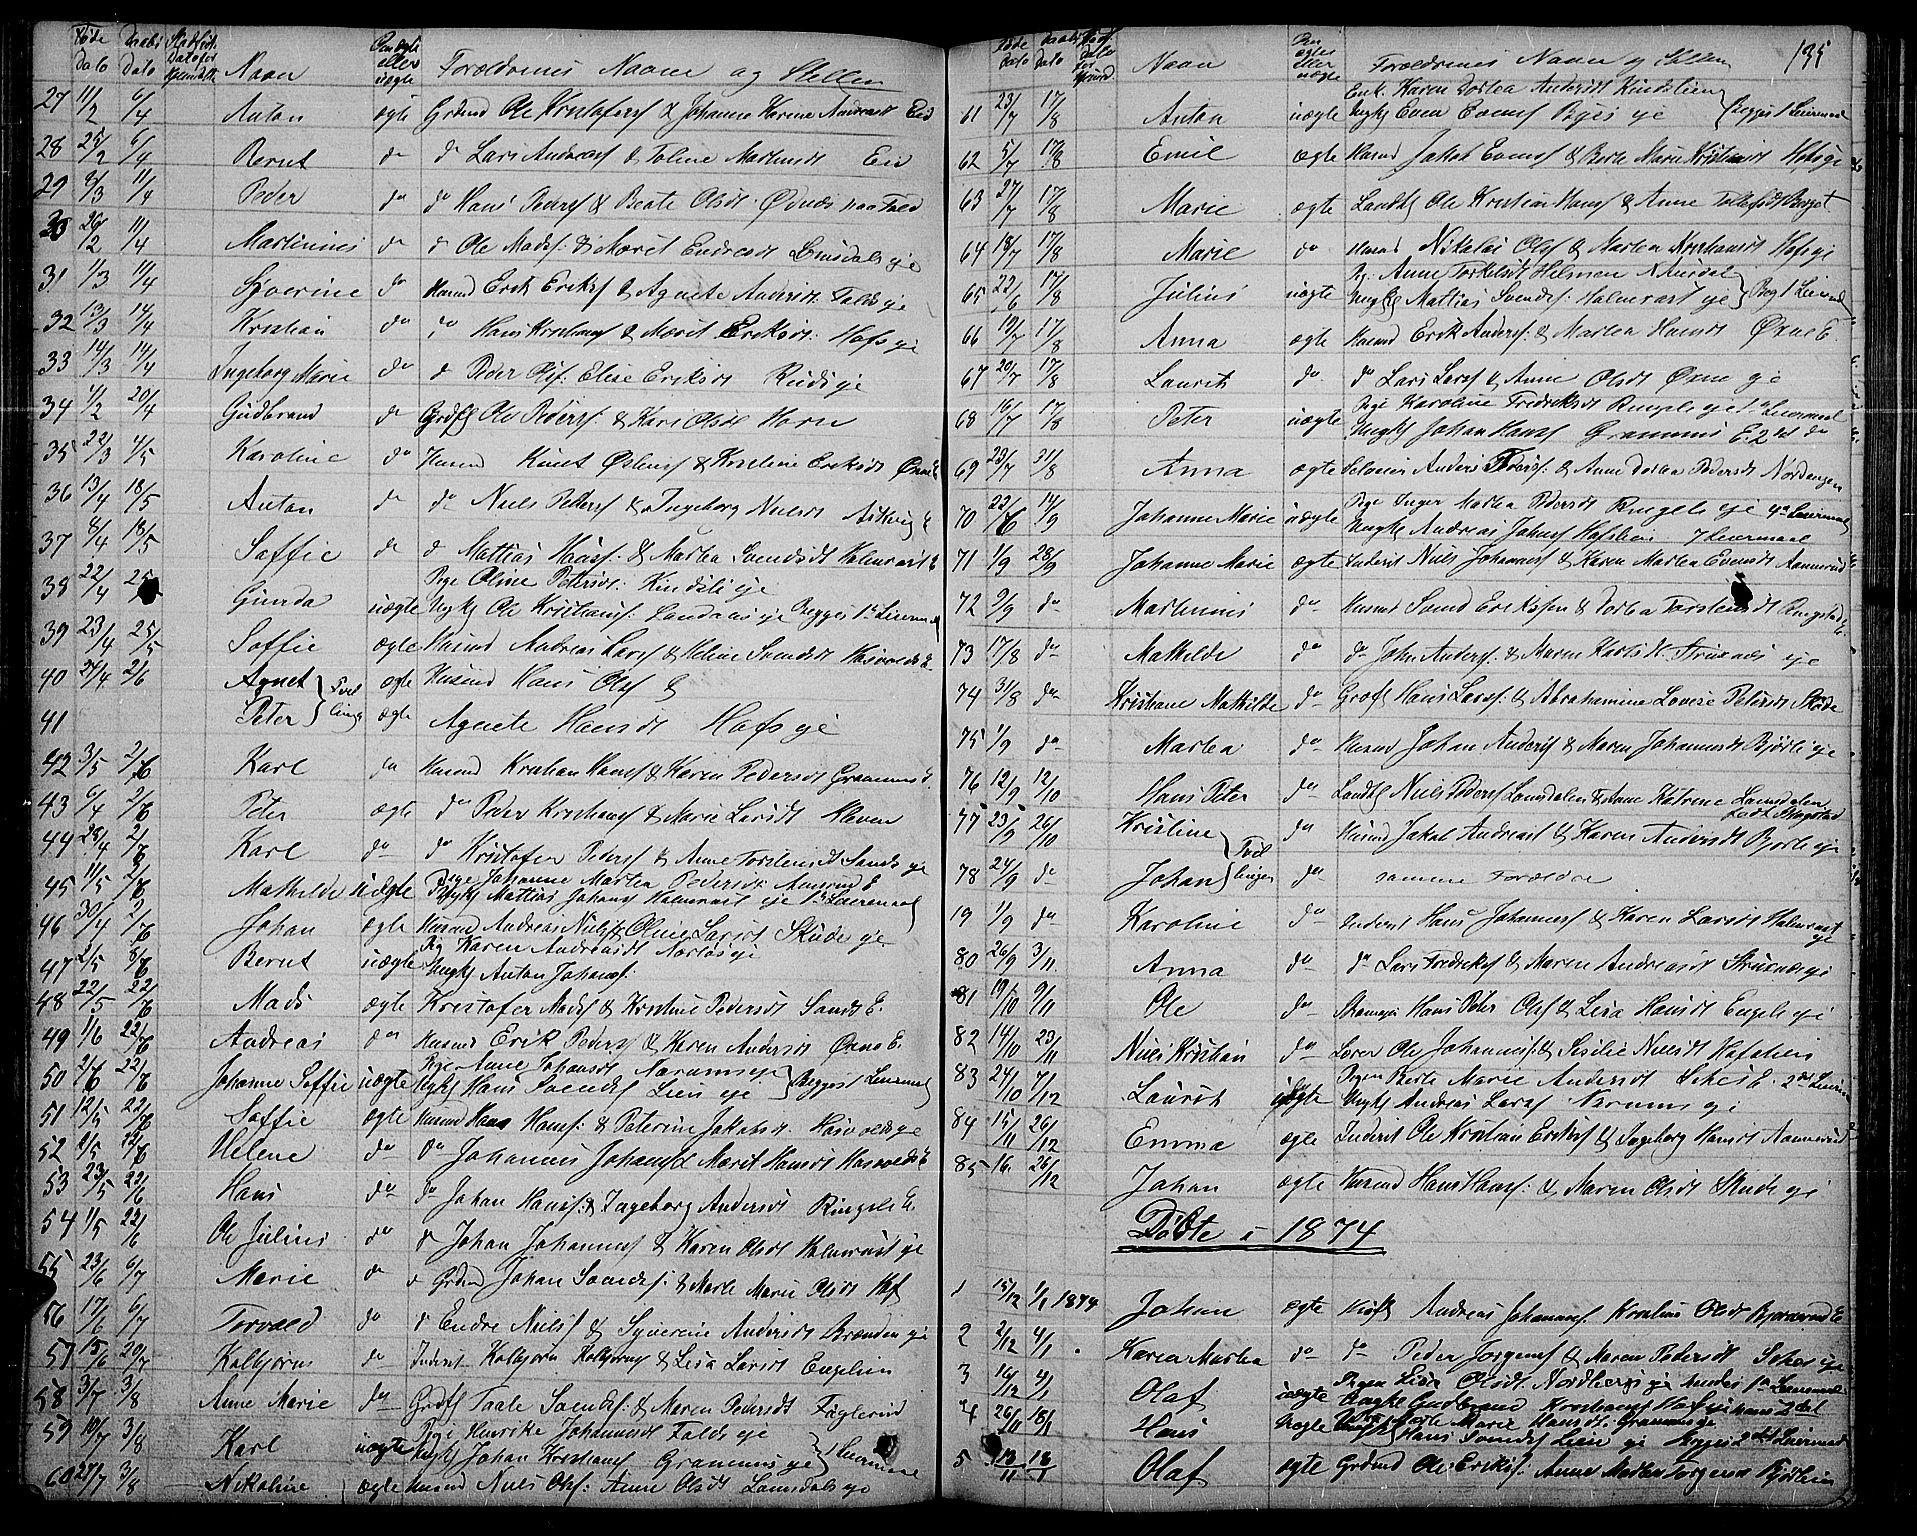 SAH, Søndre Land prestekontor, L/L0001: Klokkerbok nr. 1, 1849-1883, s. 135